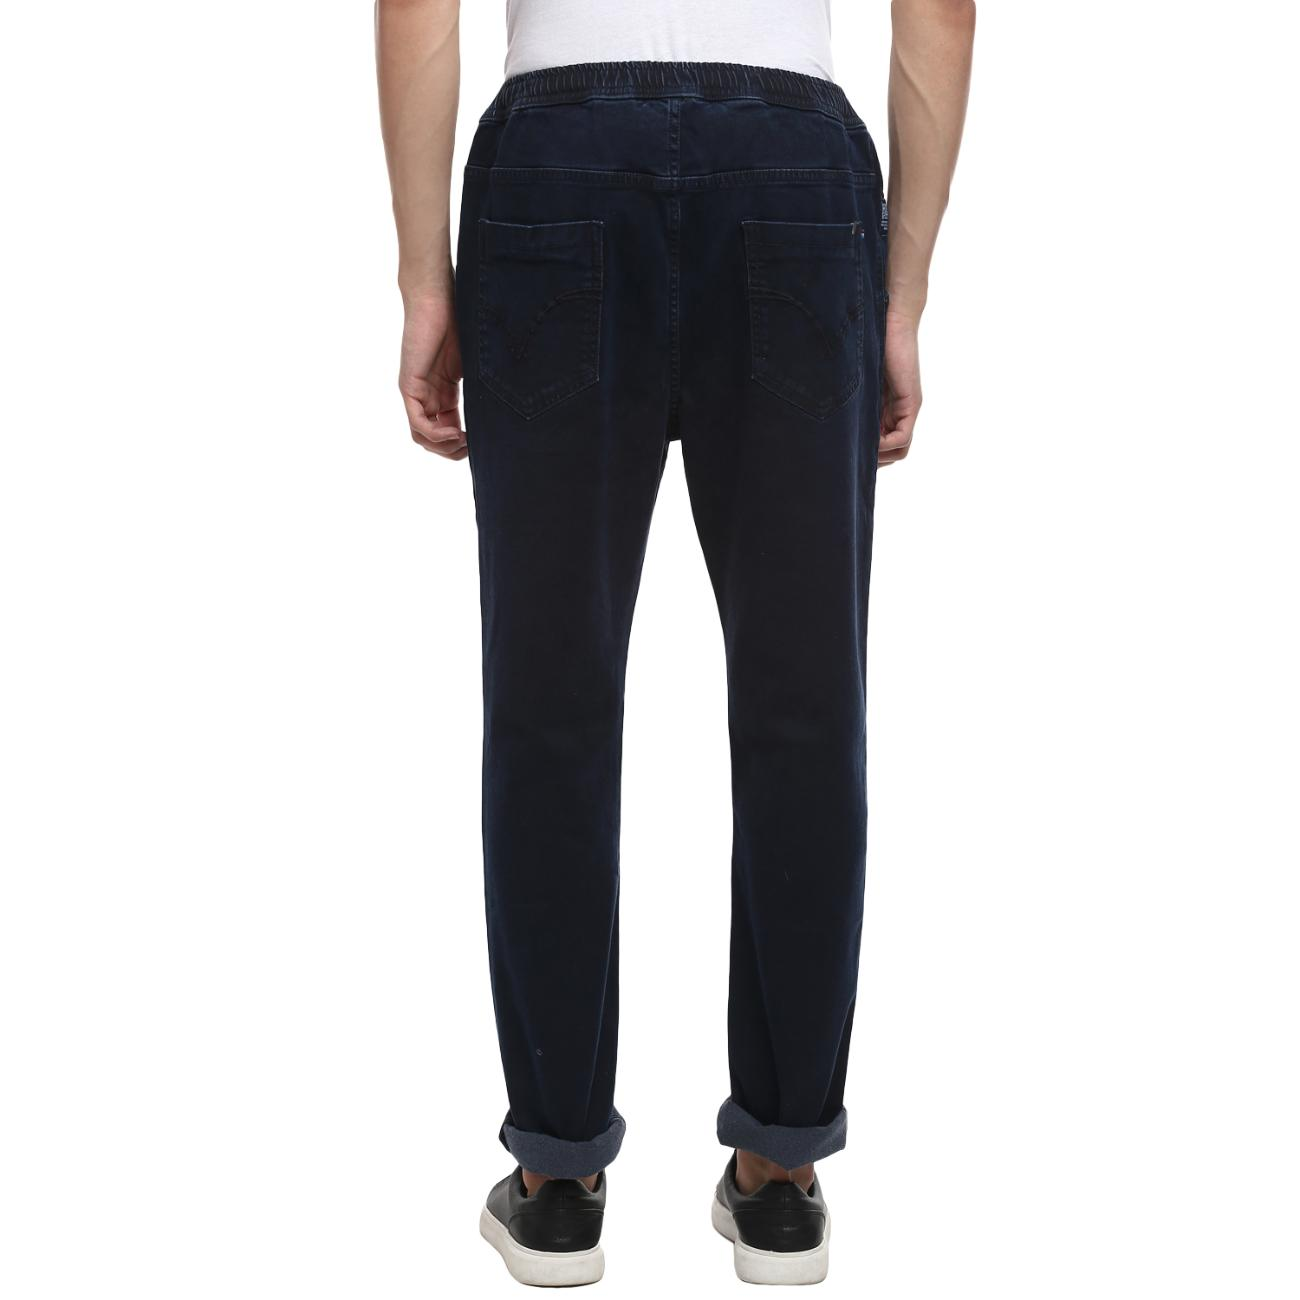 Online Blue Narrow Jeans For Men